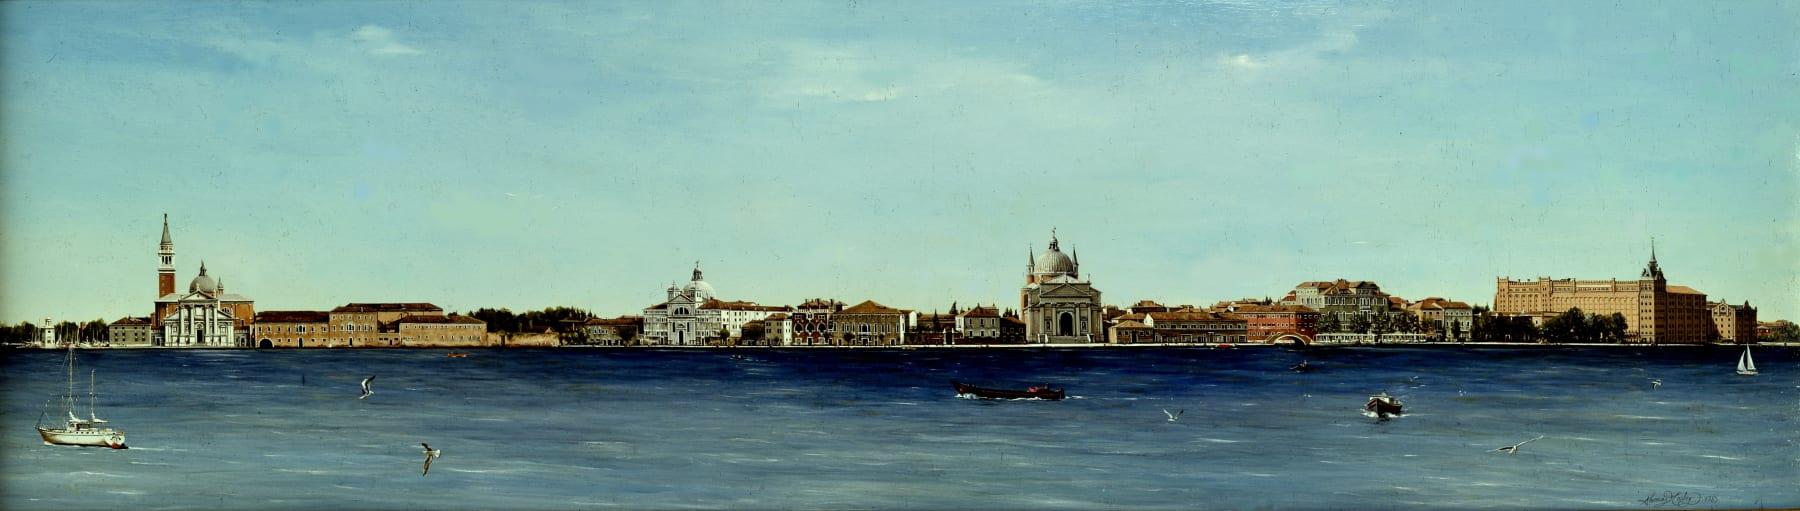 Arrigo's Venice